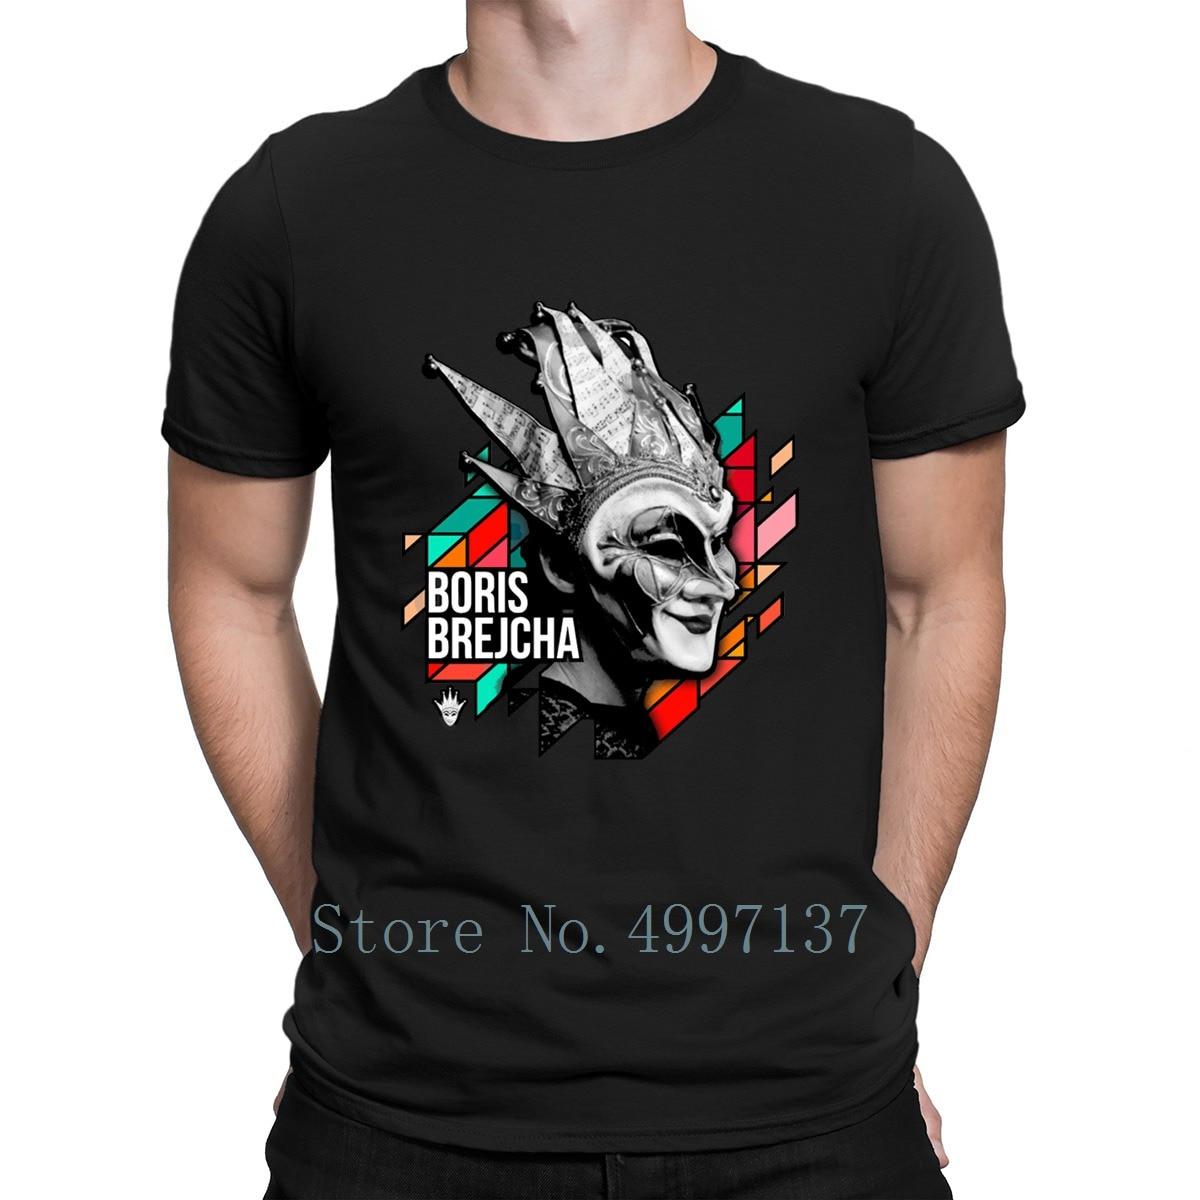 Boris Brejcha   T     Shirt   Tee   Shirt   Summer Style Unique S-3xl Designs Basic Novelty Anti-Wrinkle   Shirt